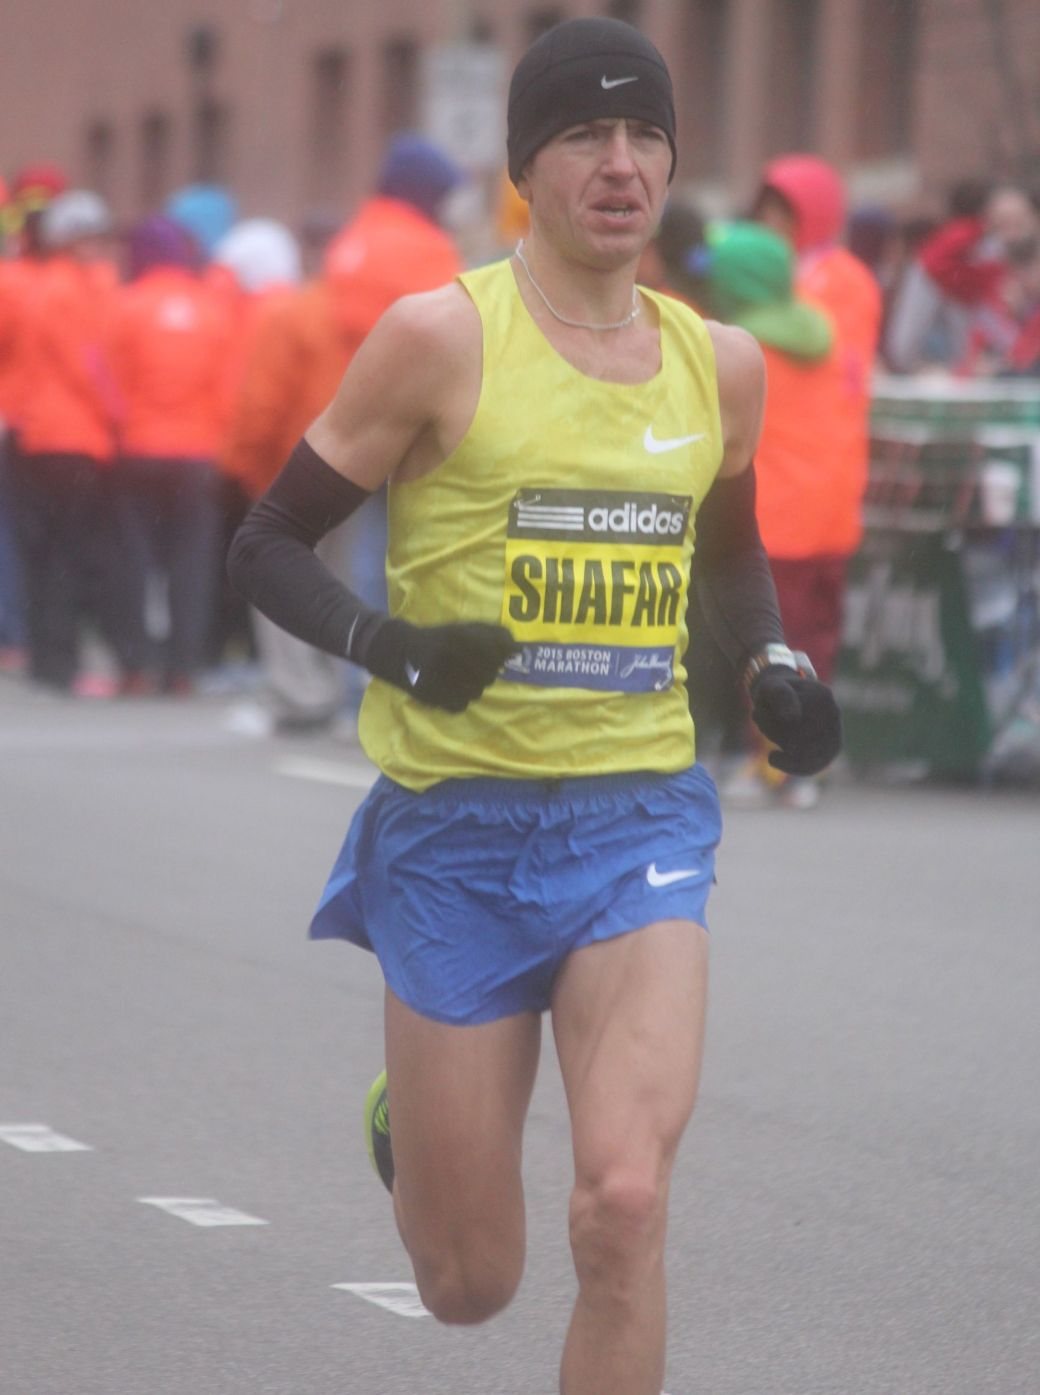 boston marathon april 20 2015 mens elite race vitaliy shafar